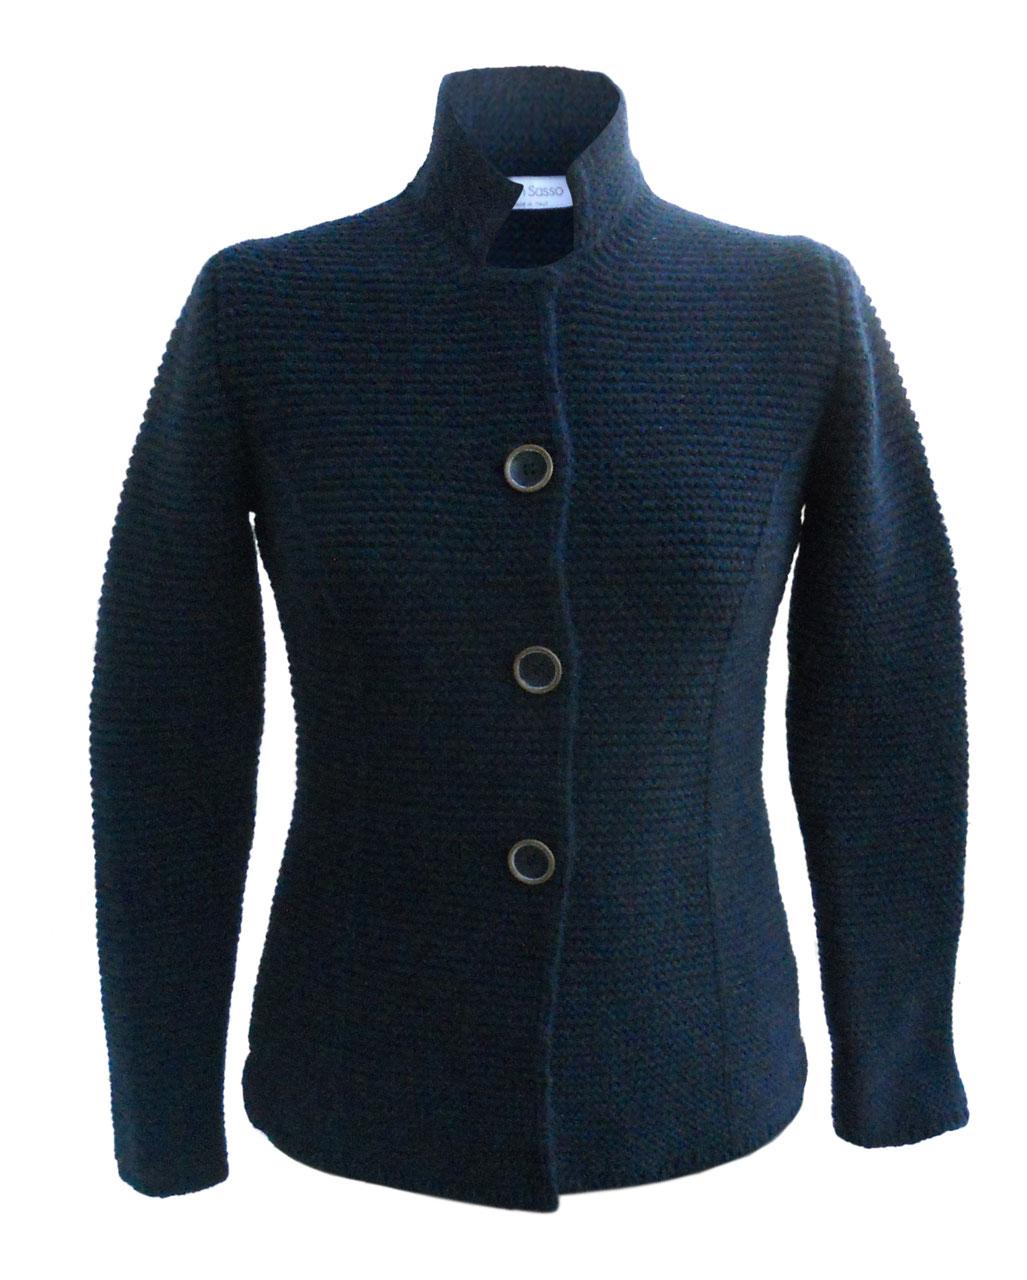 sale retailer 39164 0b4d9 Gran Sasso Cardigan Donna. 100% Pura Lana - BELLUCCI